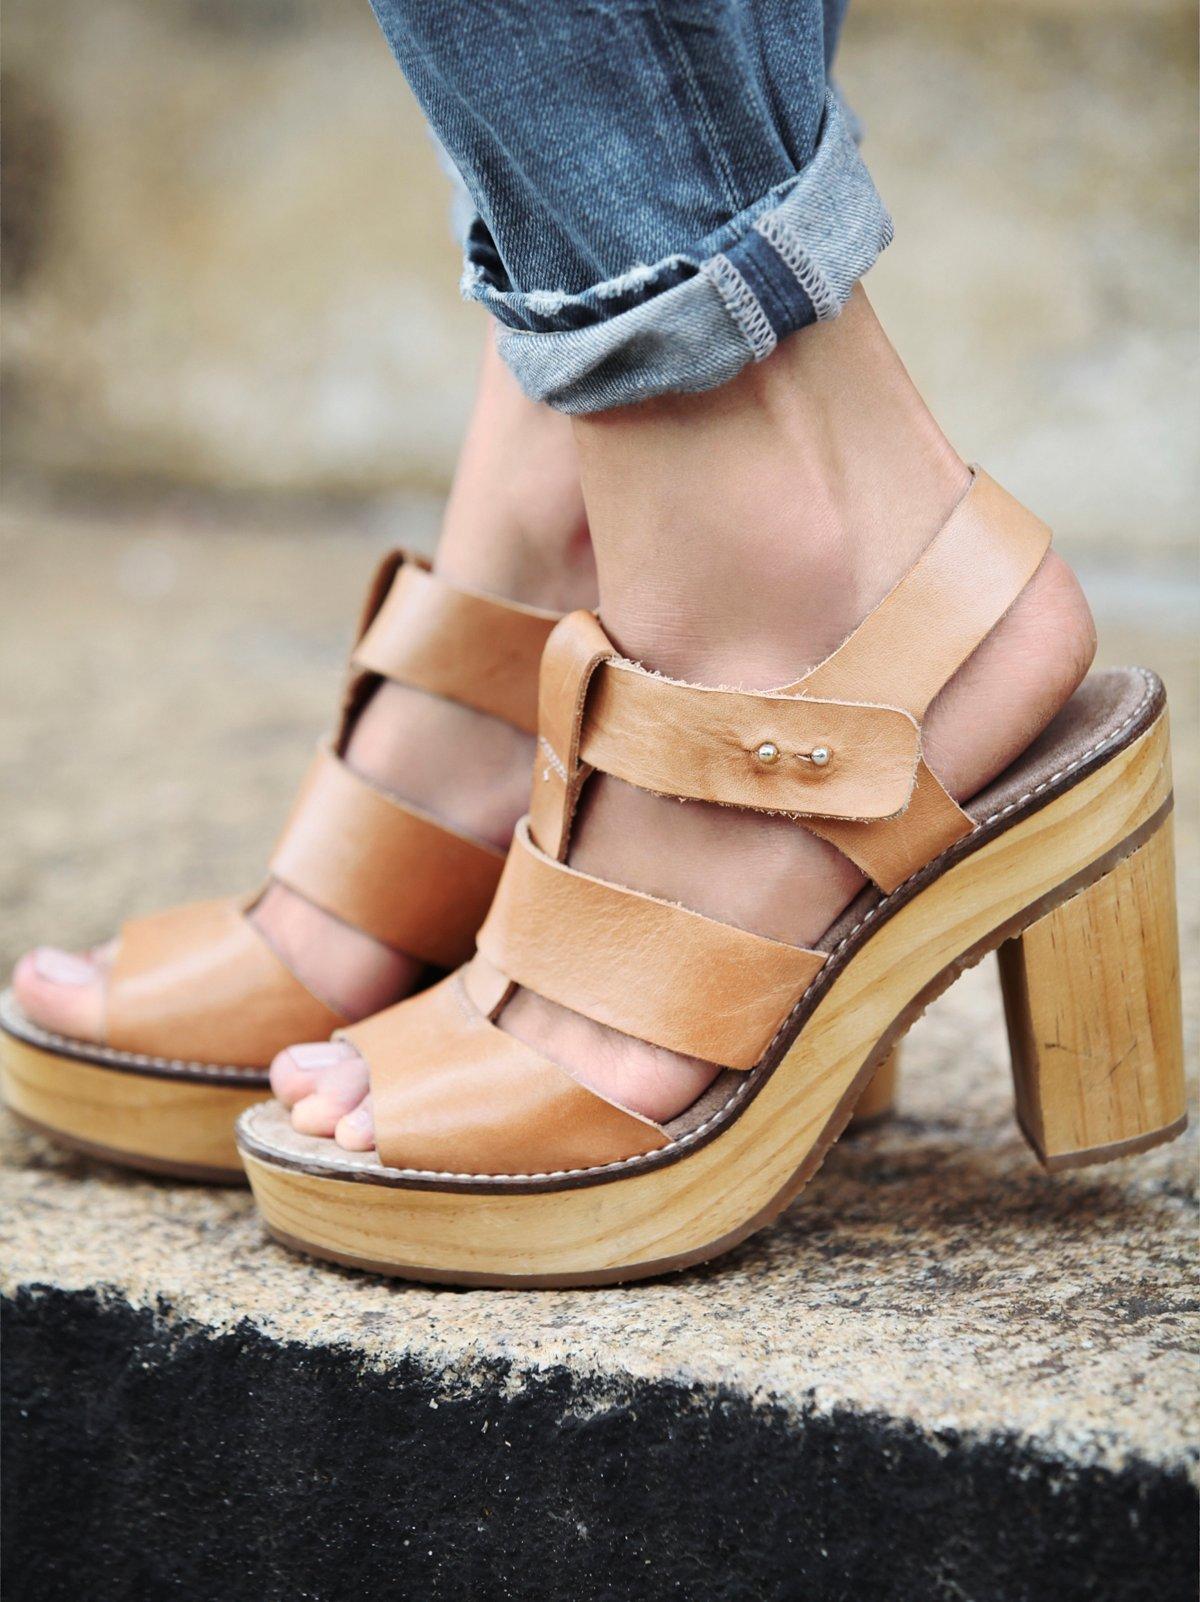 Dule Platform高跟凉鞋